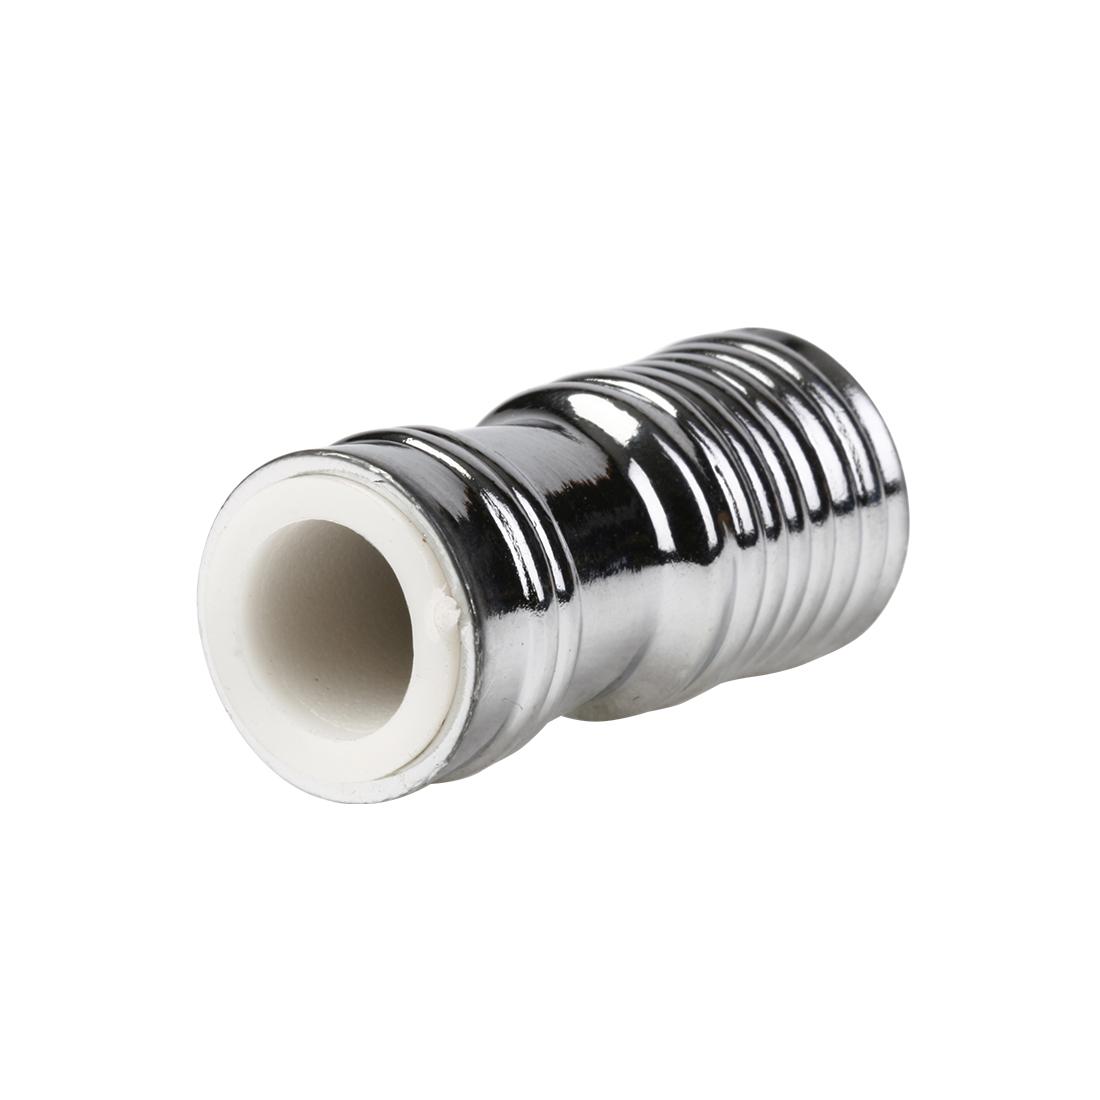 adaptateur tuyau pour grande chicha